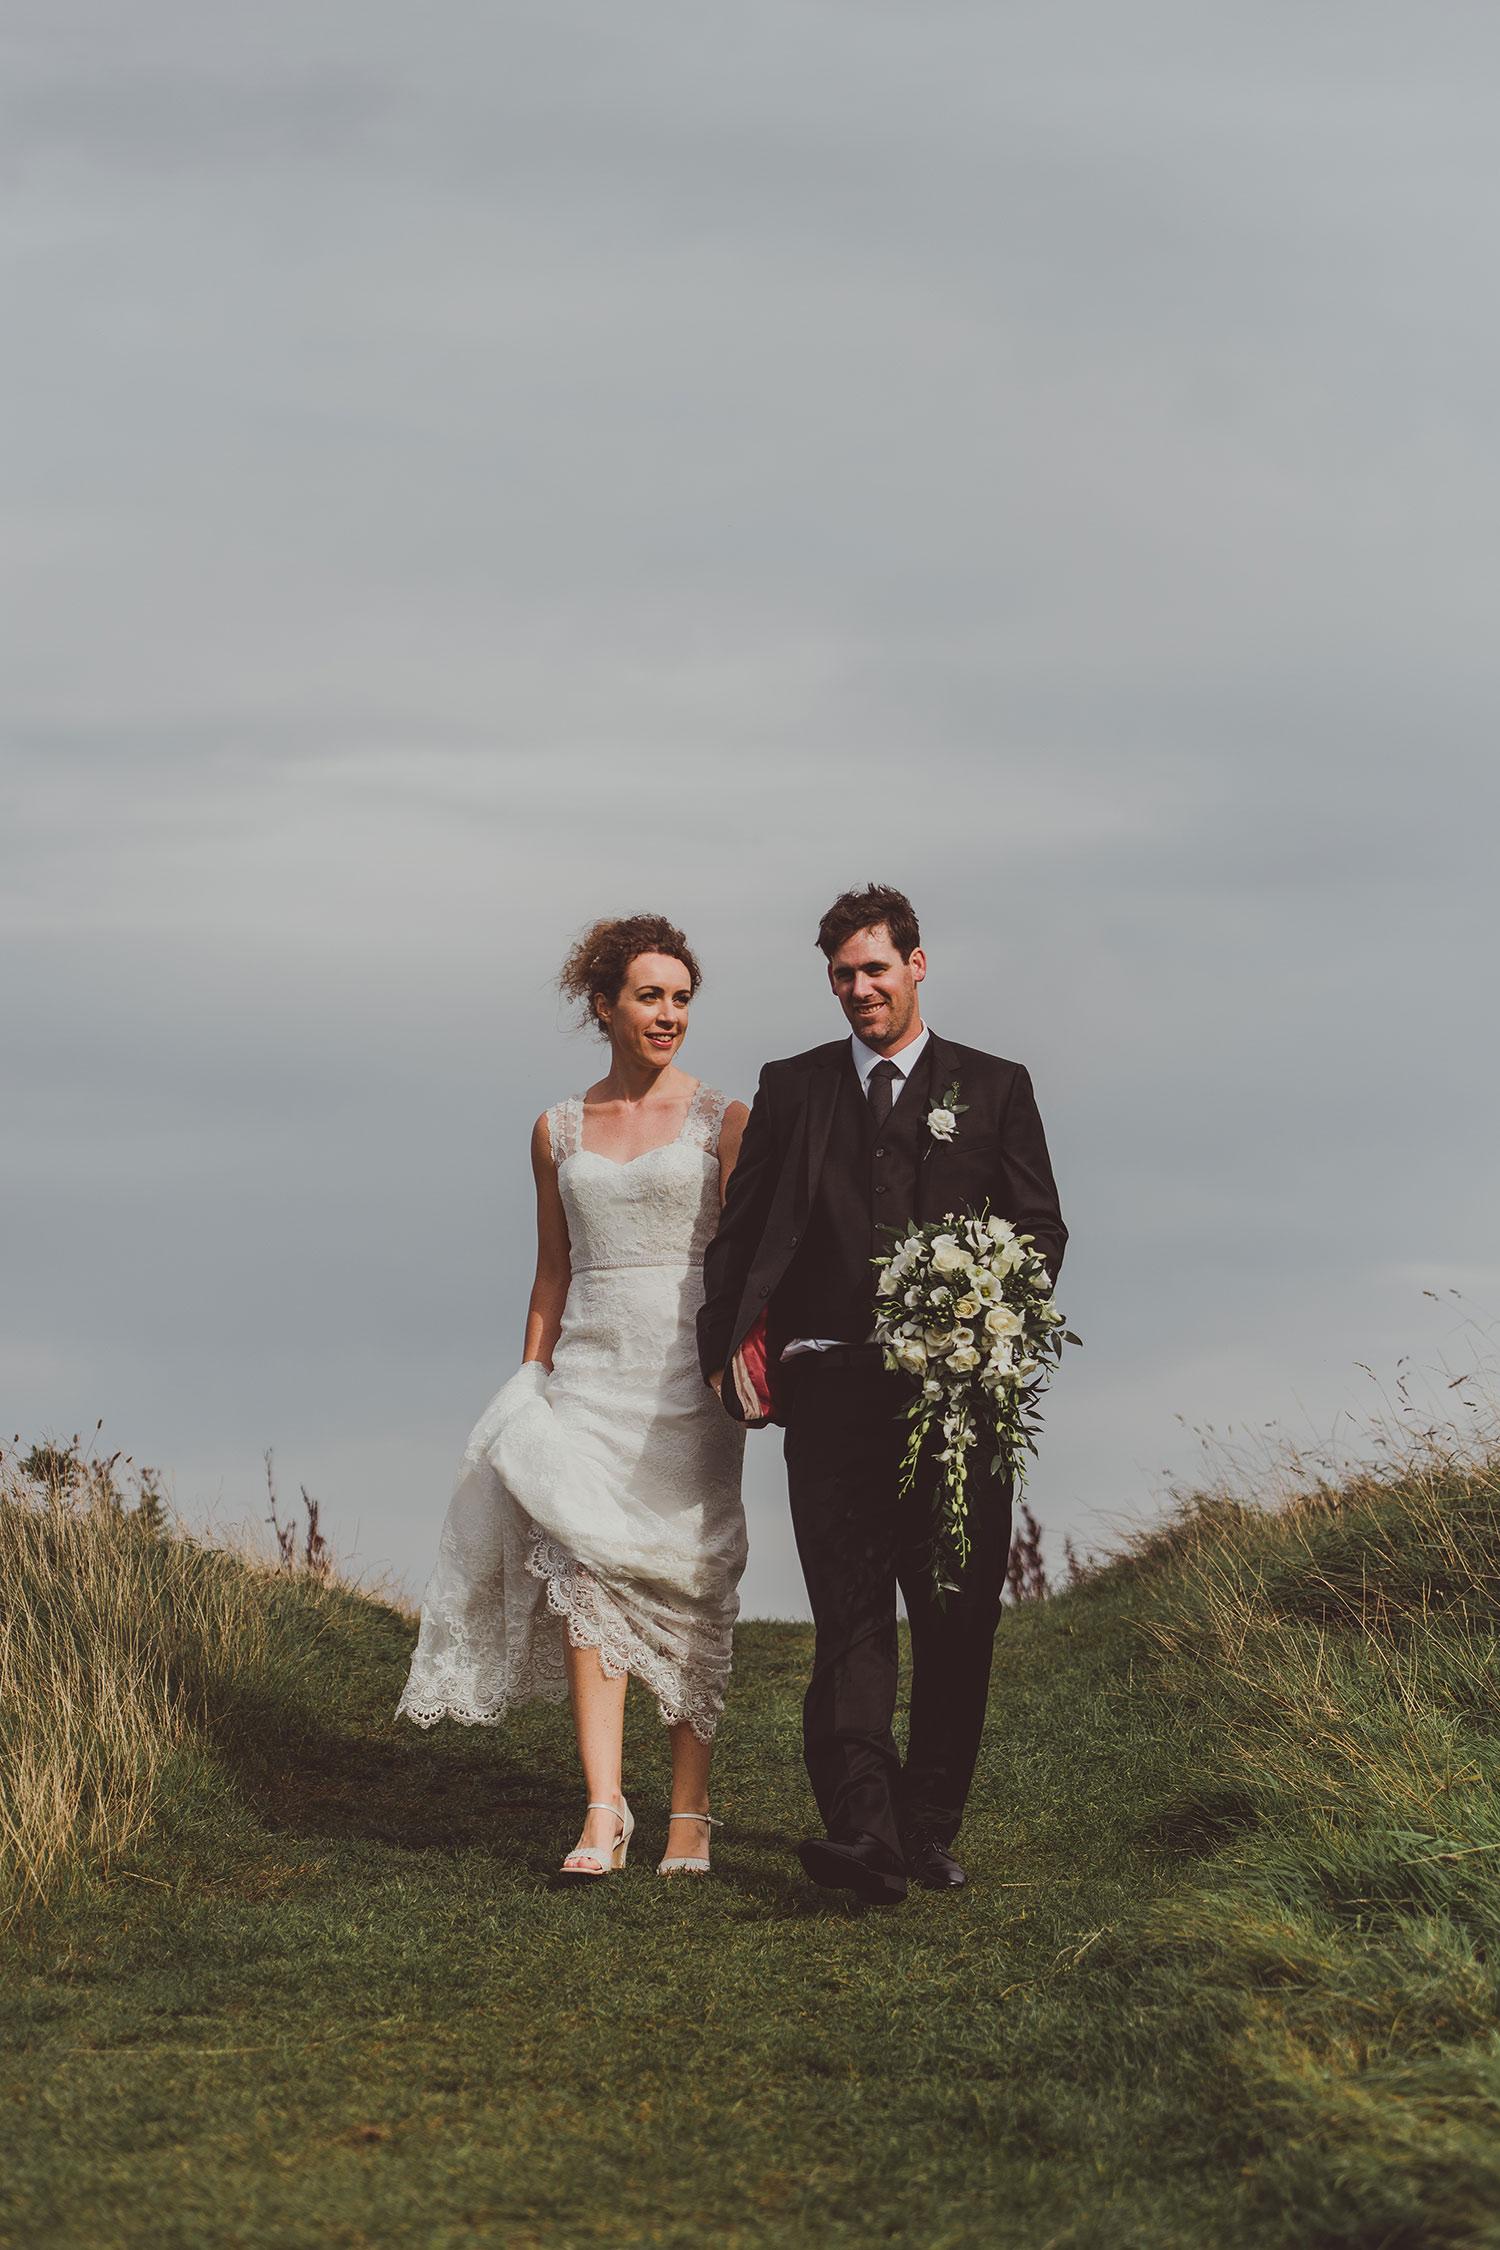 tinakilly-house-wedding-photographer078.jpg